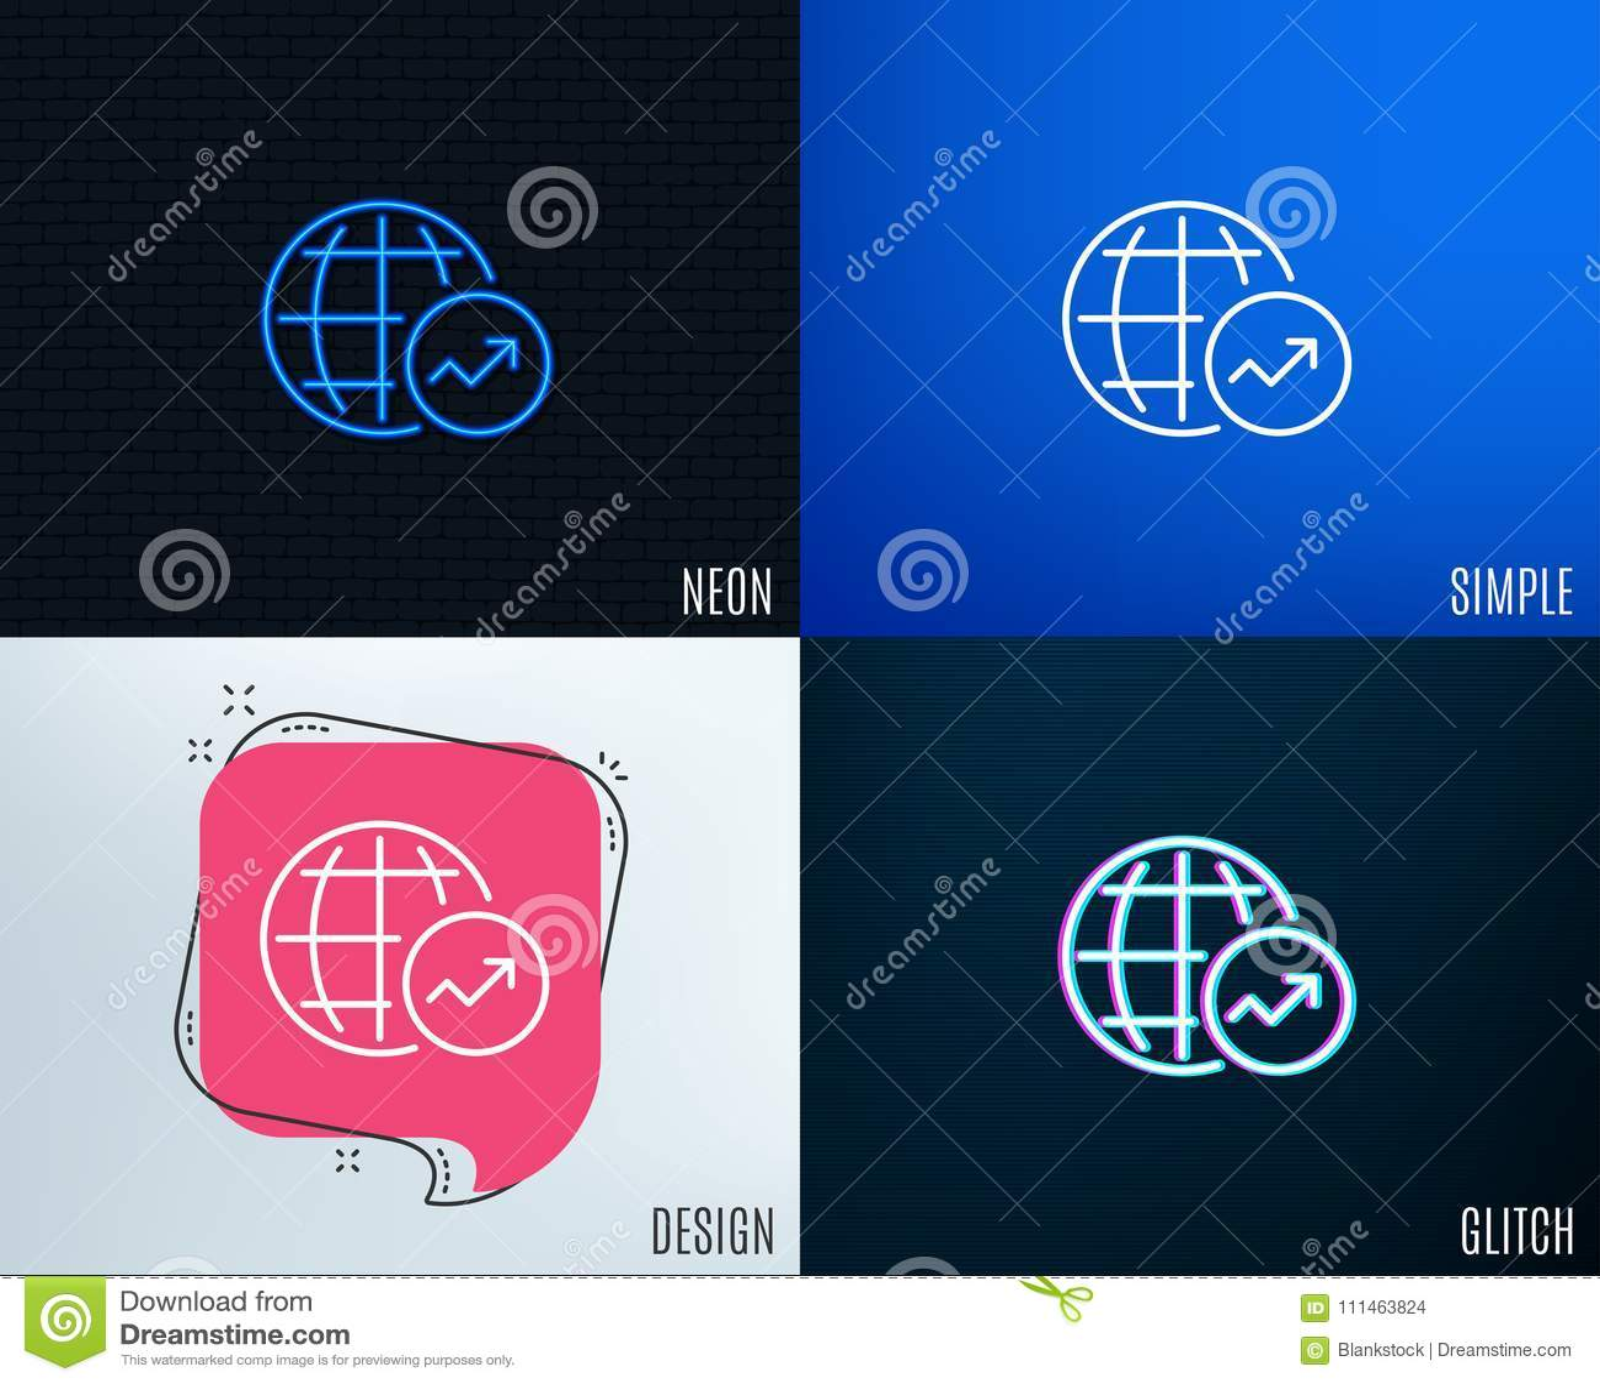 hight resolution of world statistics line icon chart sign